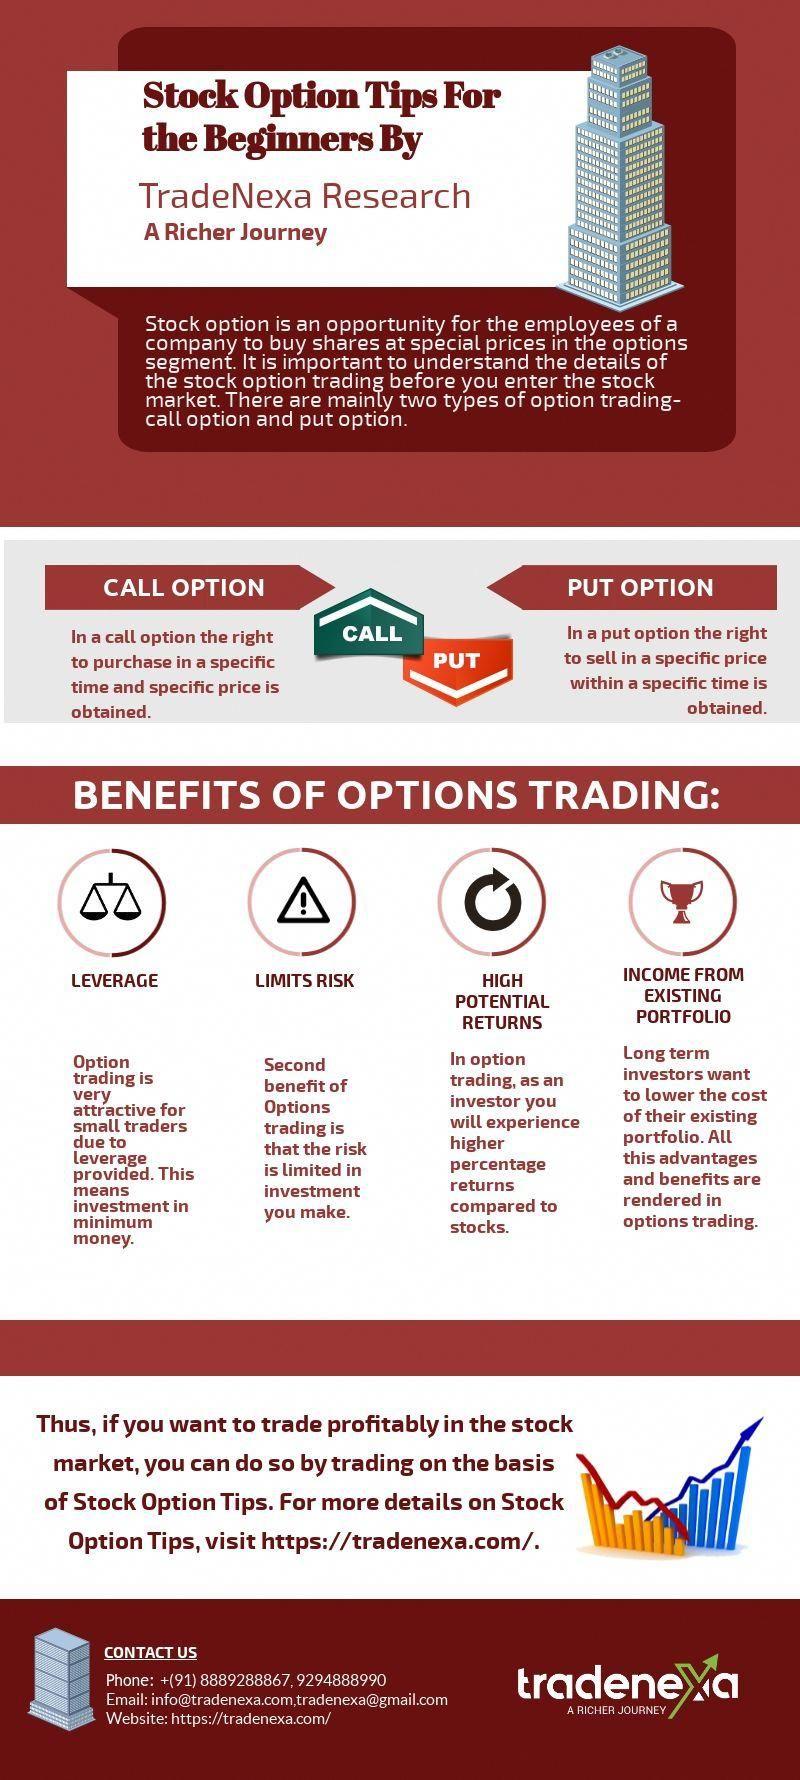 Best website for options trading information